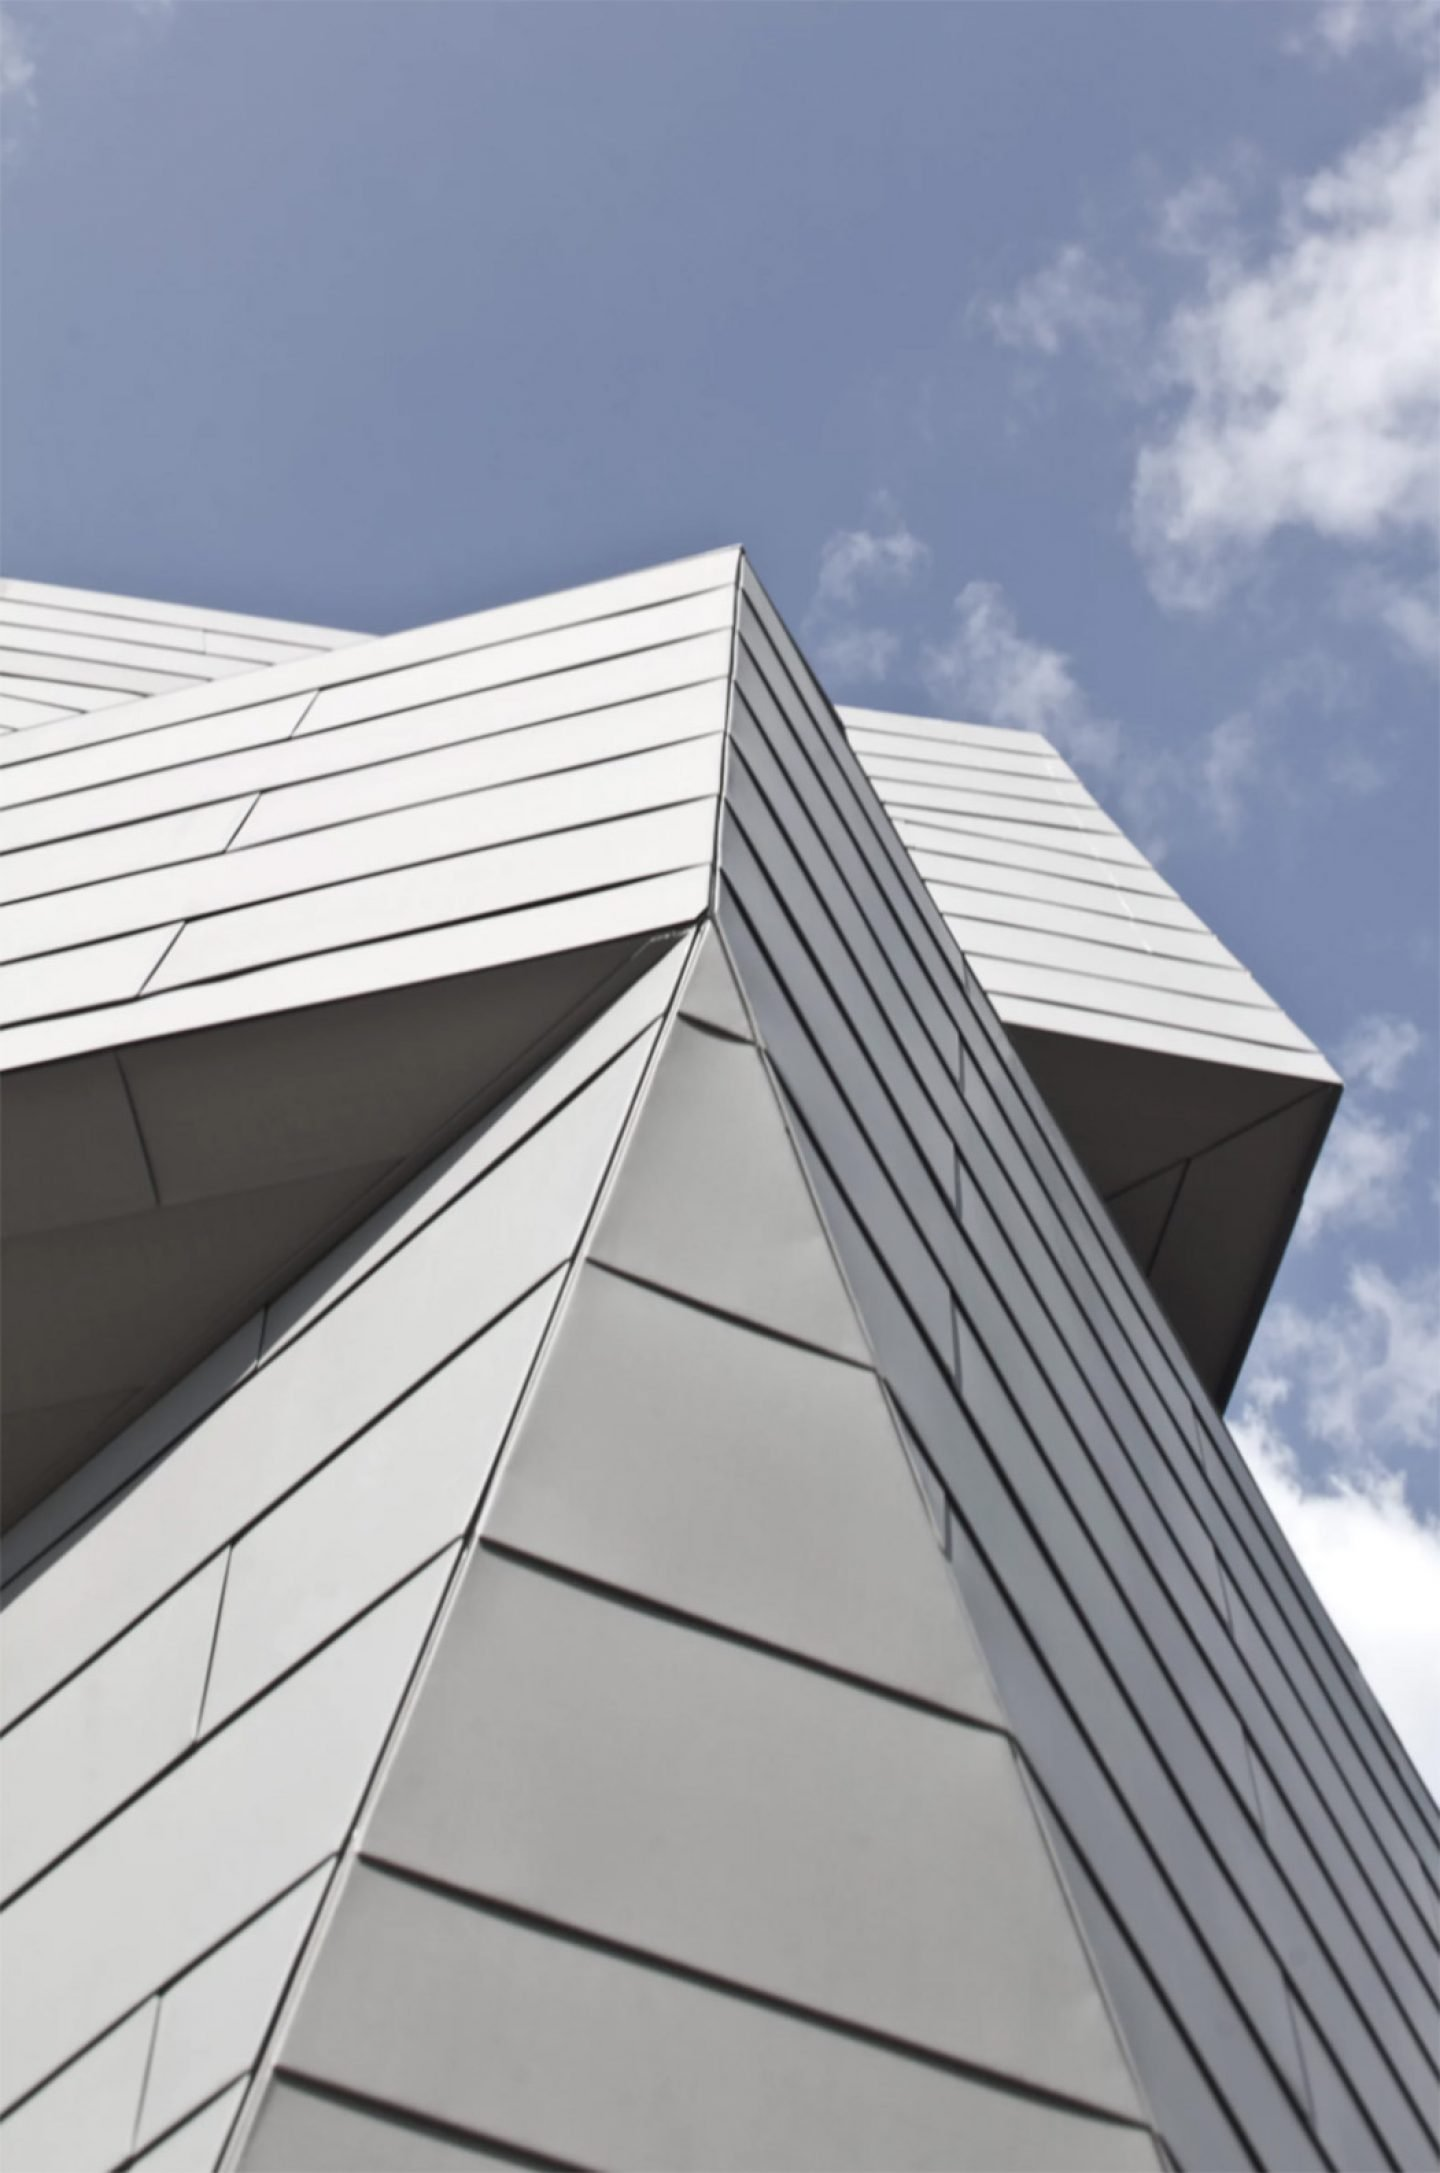 Architecture_GemmaObservatory_AnmahianWintonArchitects_09